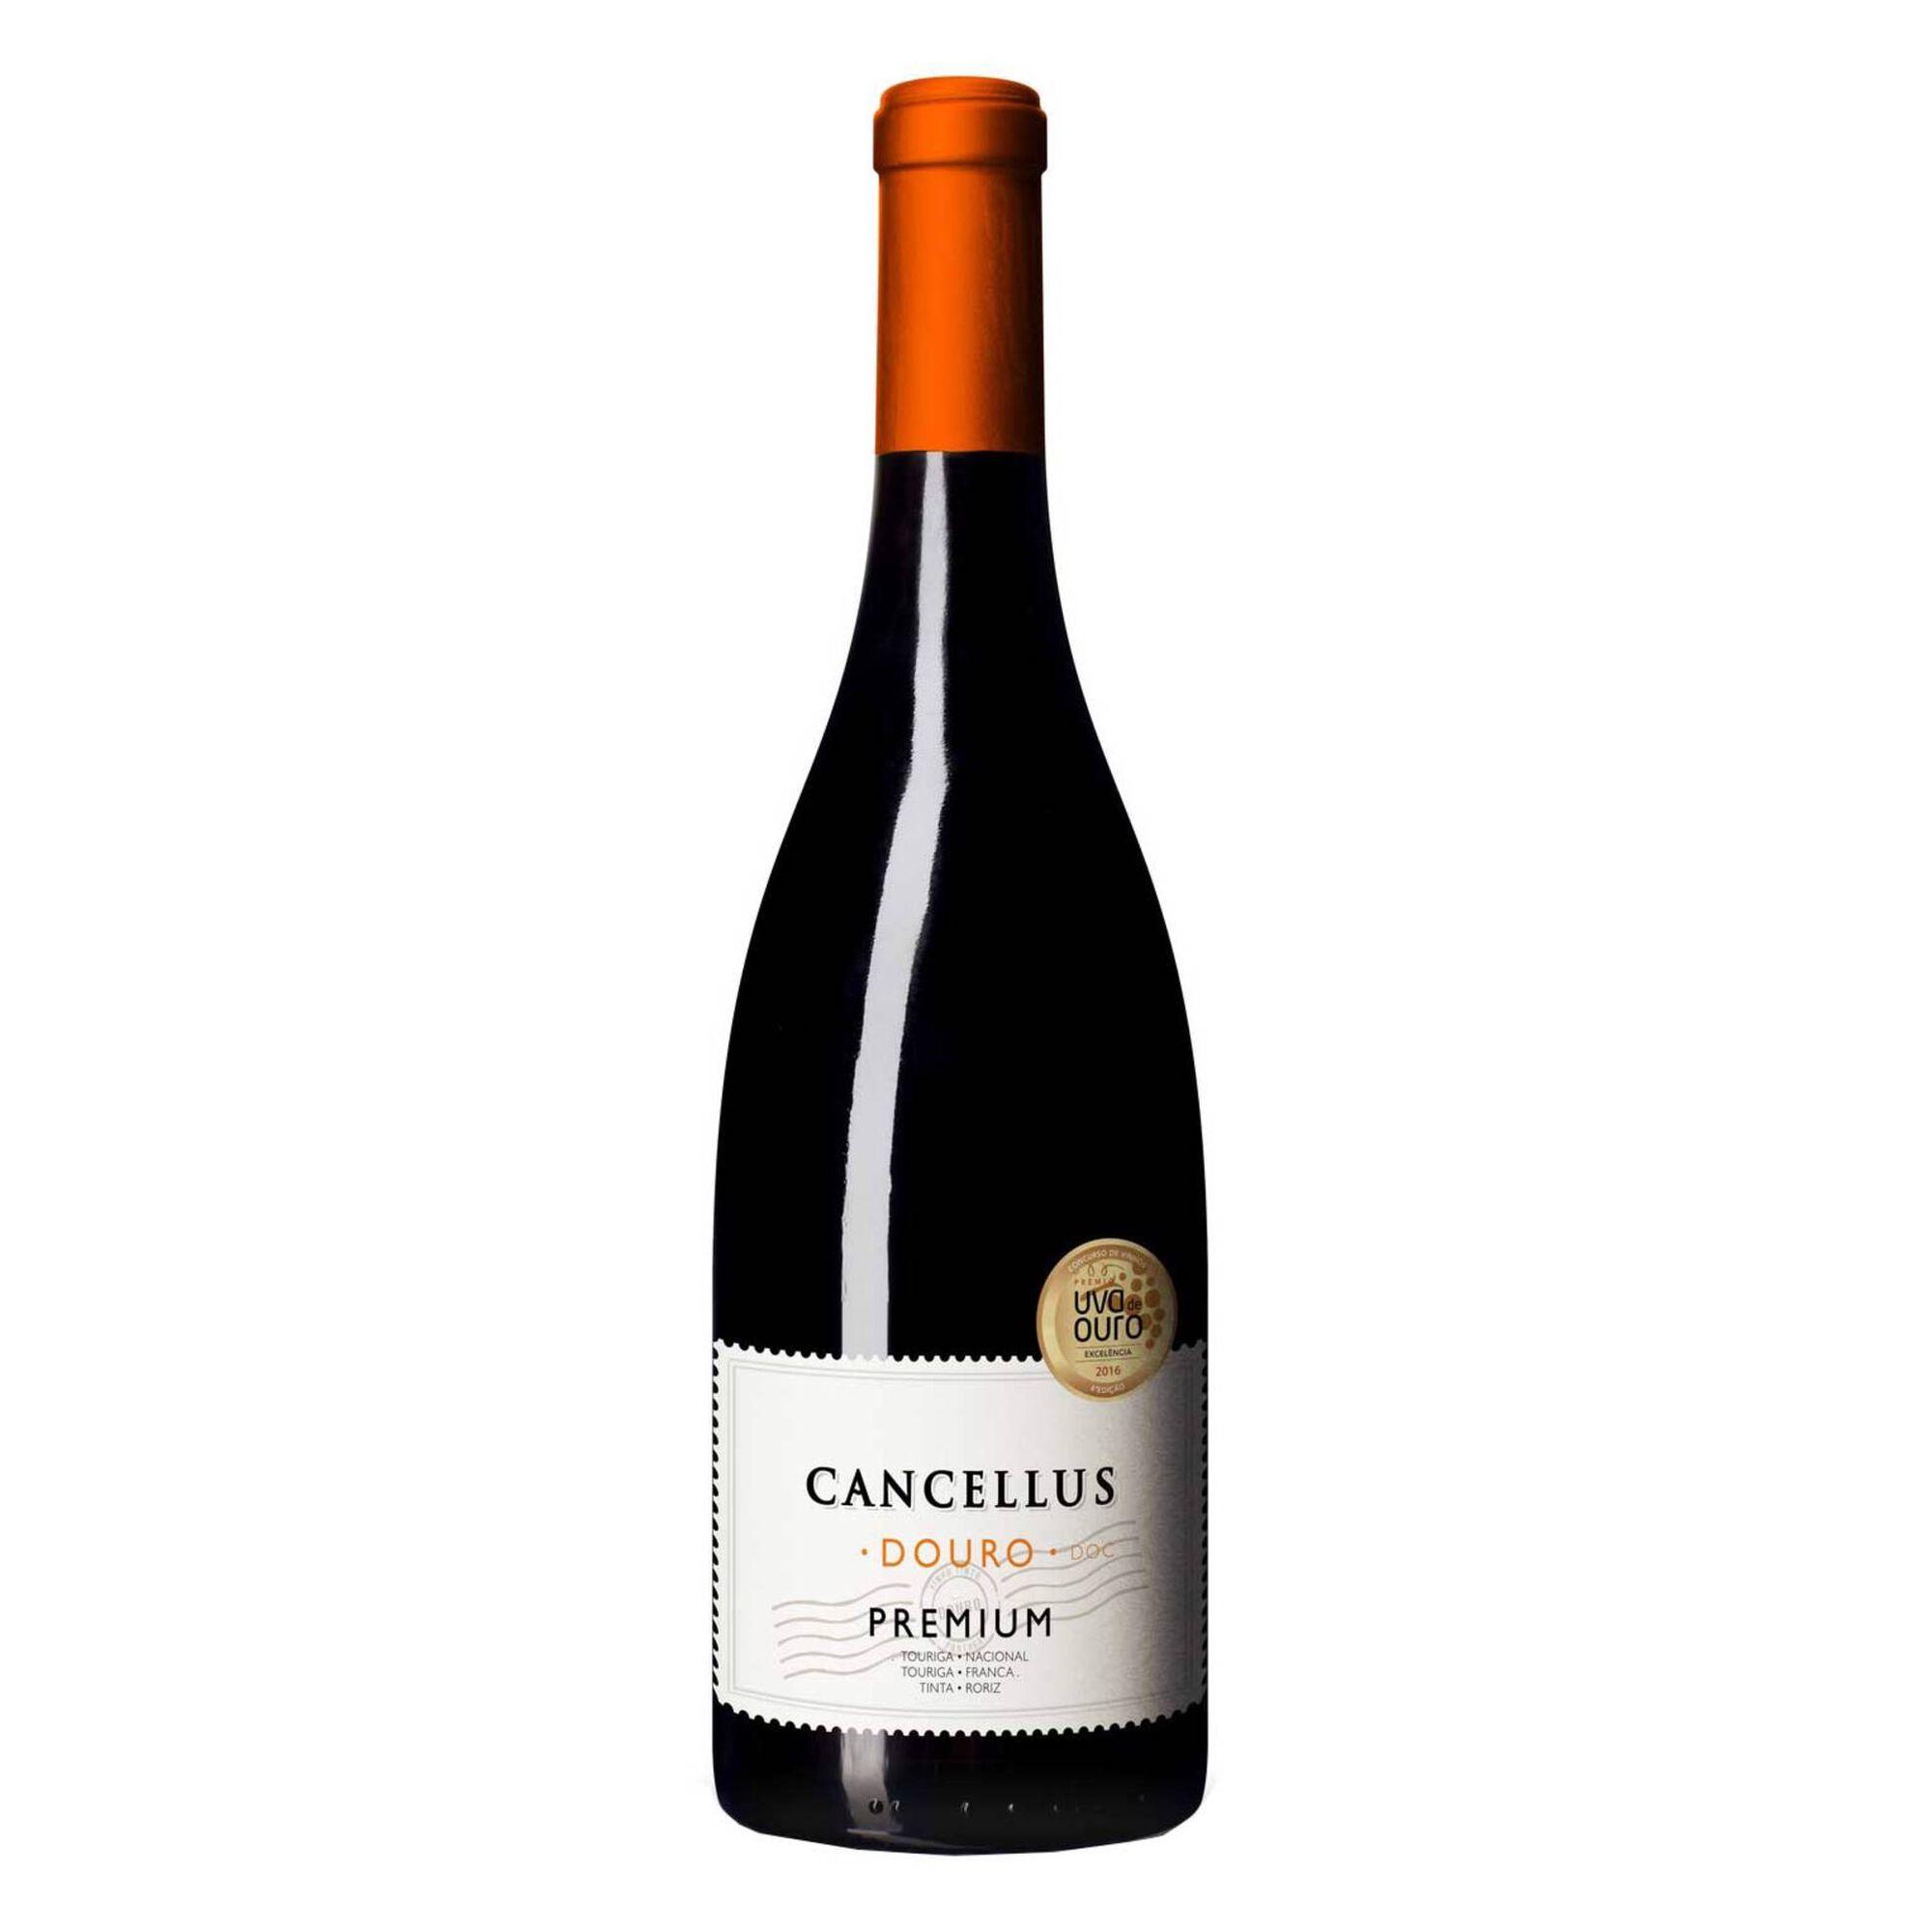 Cancellus Premium DOC Douro Vinho Tinto